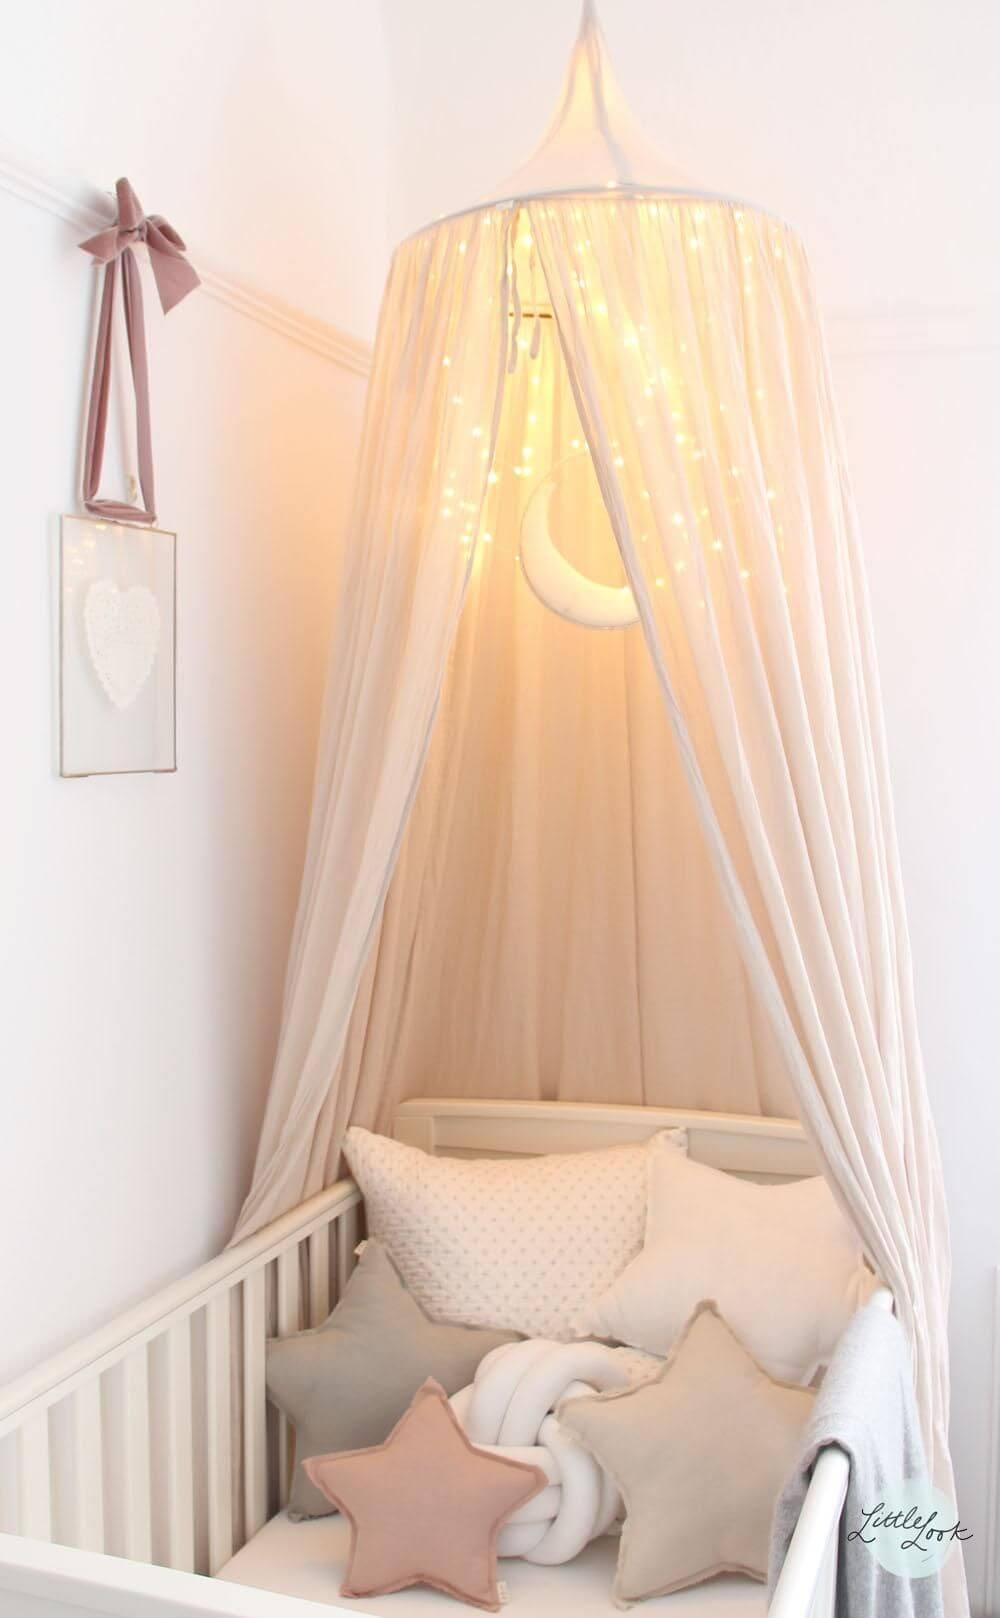 Soften Night Lights Inside a Net Canopy